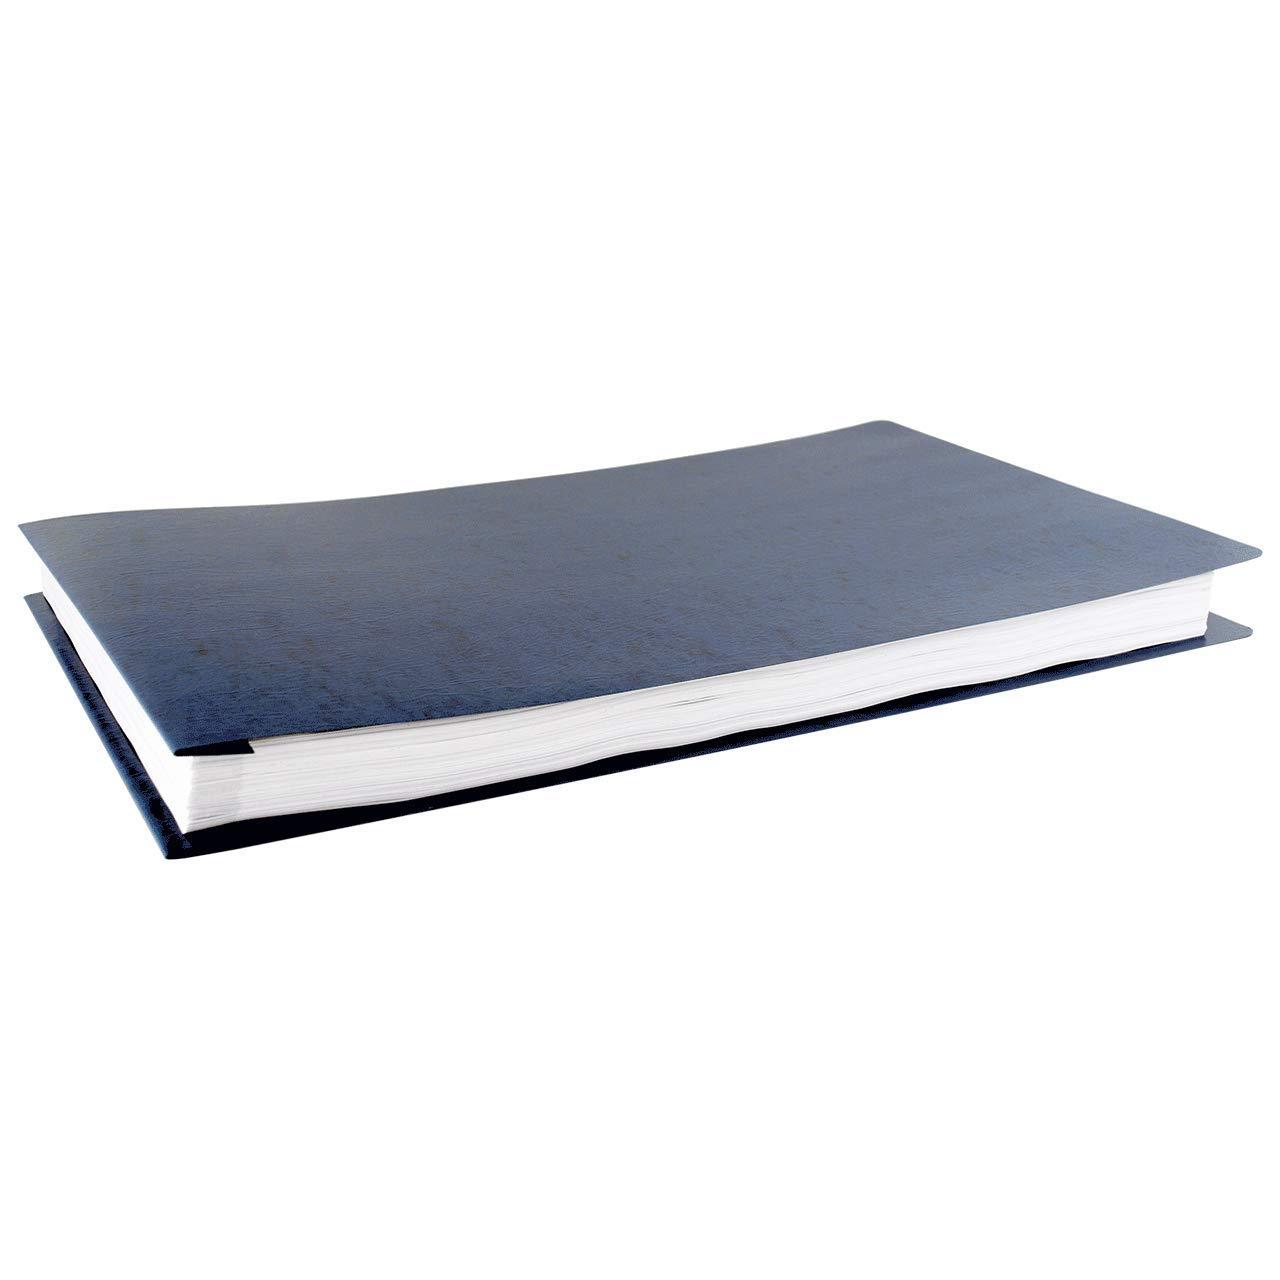 11x17 Pressboard Binder, Pack of 10, Midnight Blue (526322) by Ruby Paulina LLC